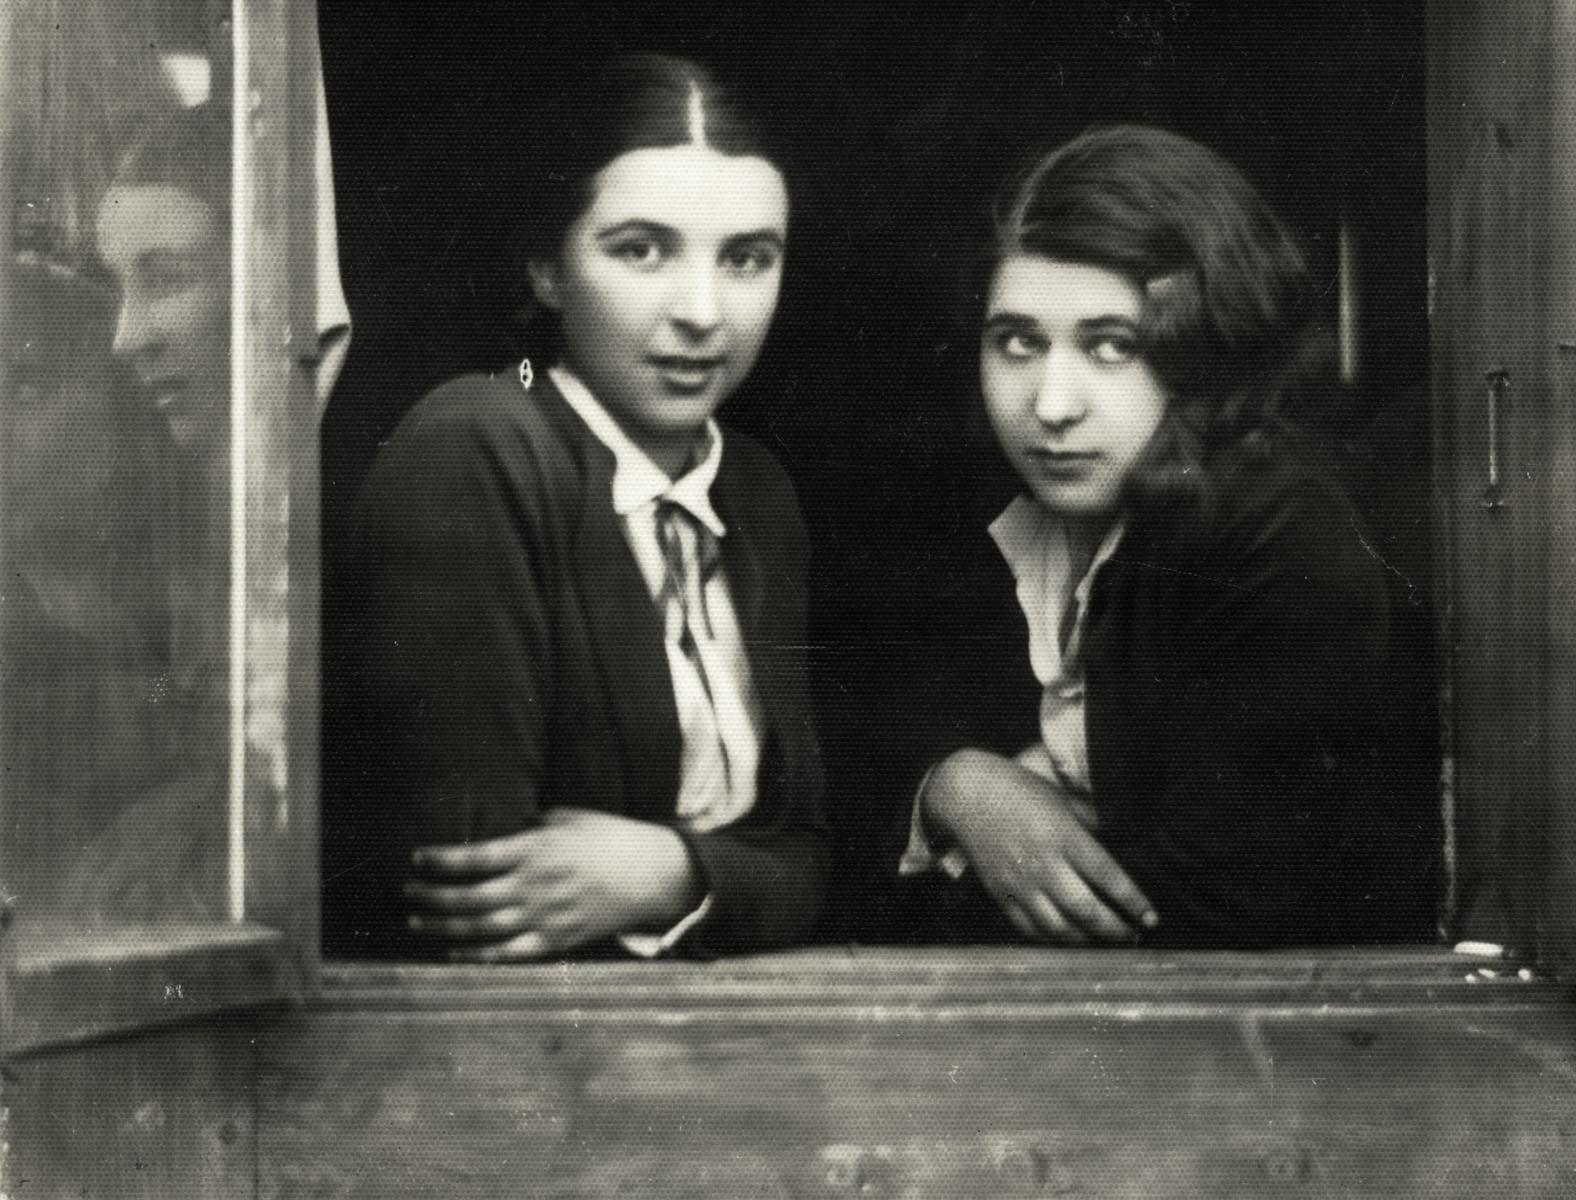 Close-up portrait of two Jewish young women, Shoshana Weiner and Chana Rudashevsky, in prewar Vilna.